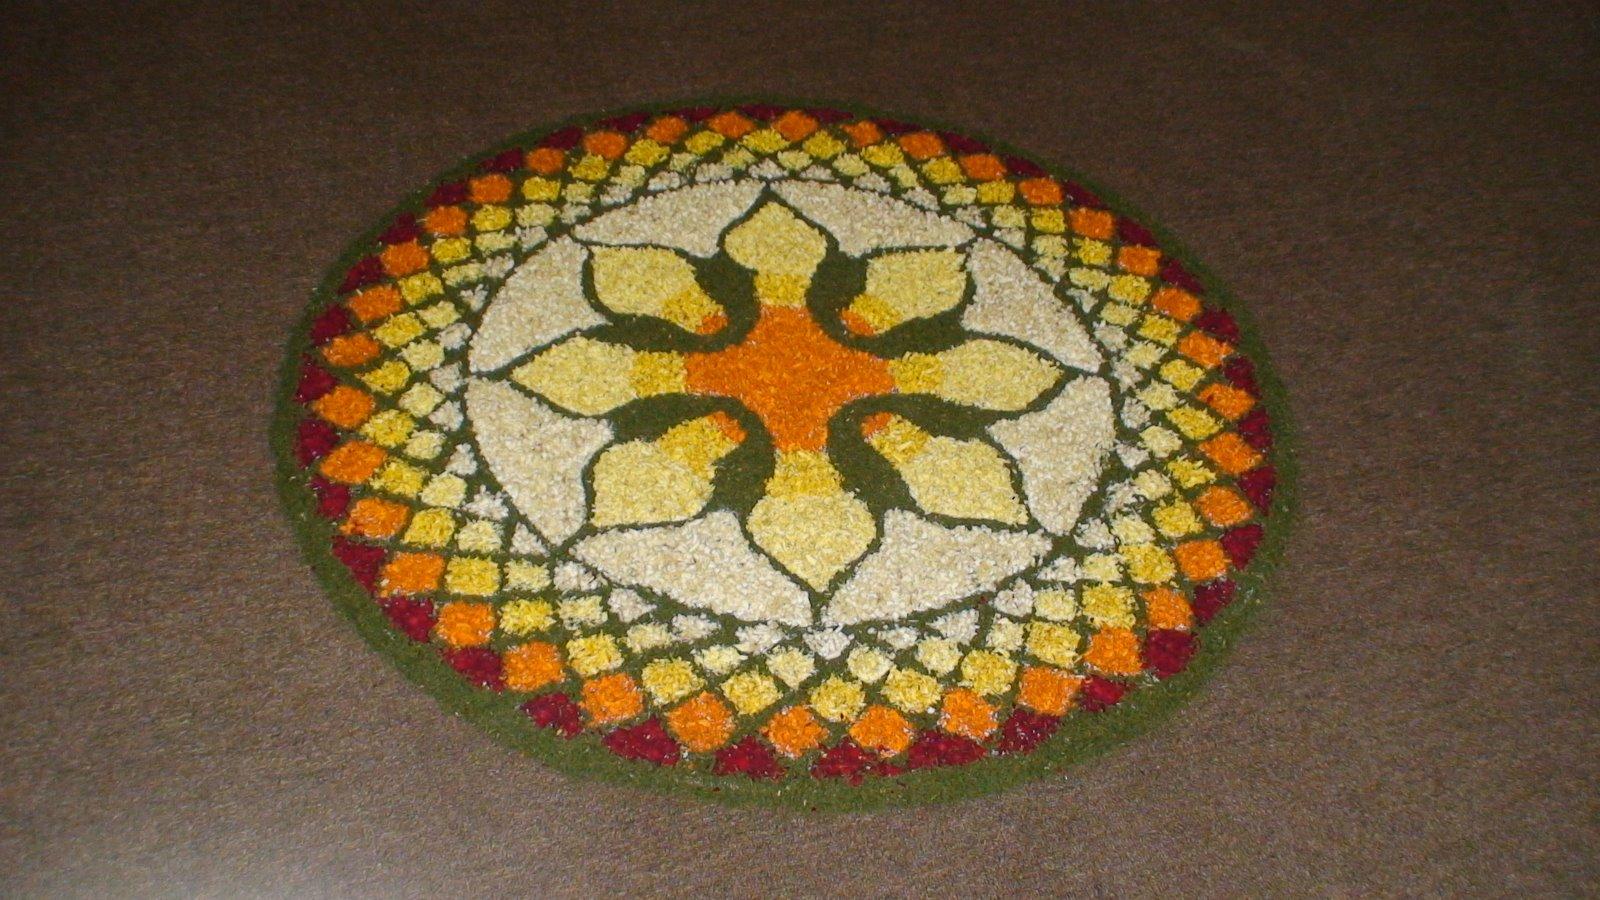 http://2.bp.blogspot.com/-WkwdtKUht1A/TfCtA79roTI/AAAAAAAABok/tCnNUW3hIjg/s1600/Kerala-Onam-rangoli-Designs_2.JPG